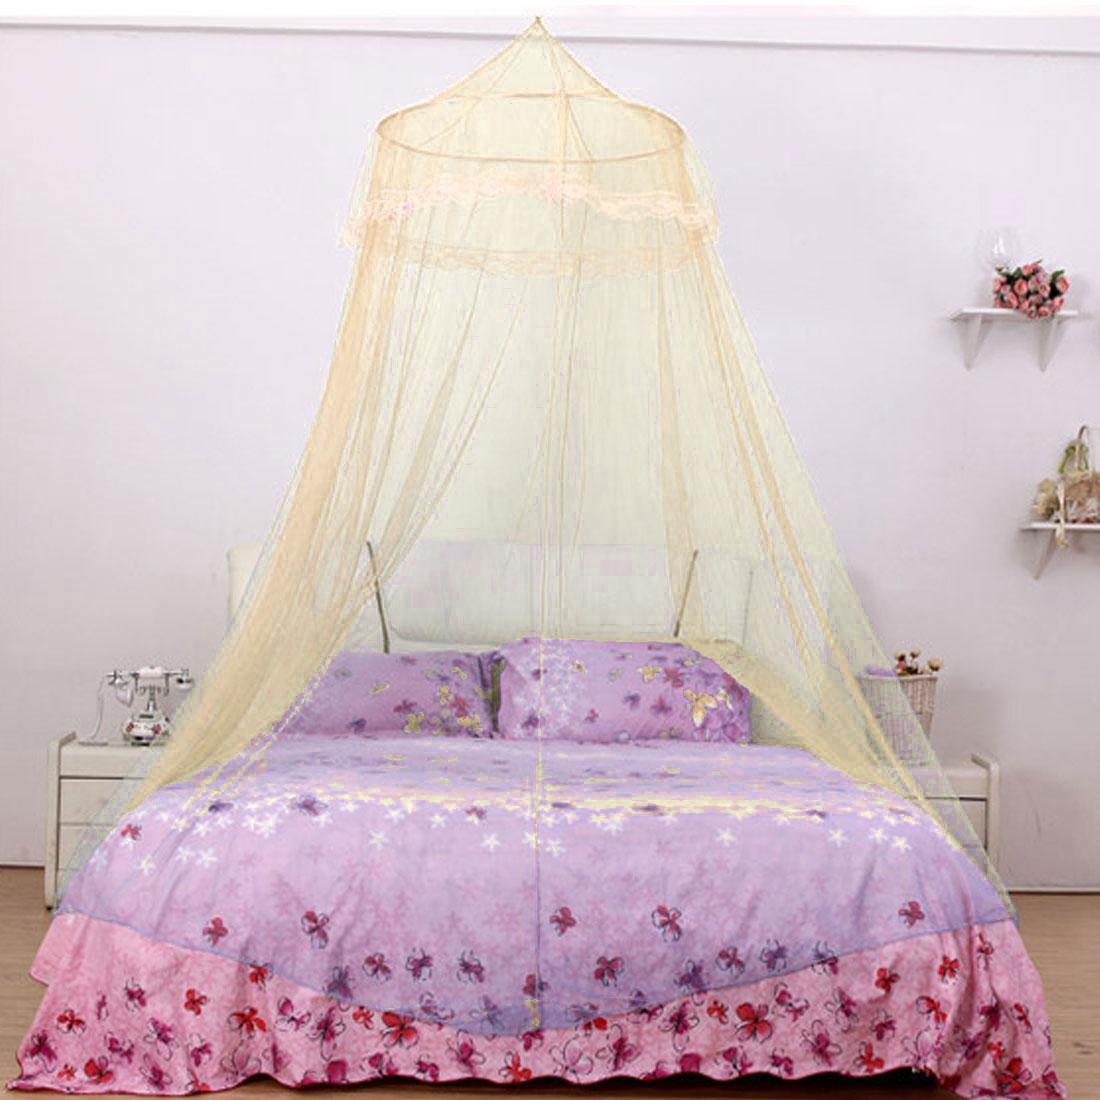 Home Bedroom Round Top Hanging Kit Mesh Bedding Mosquito Net Yellow 210 x 60cm